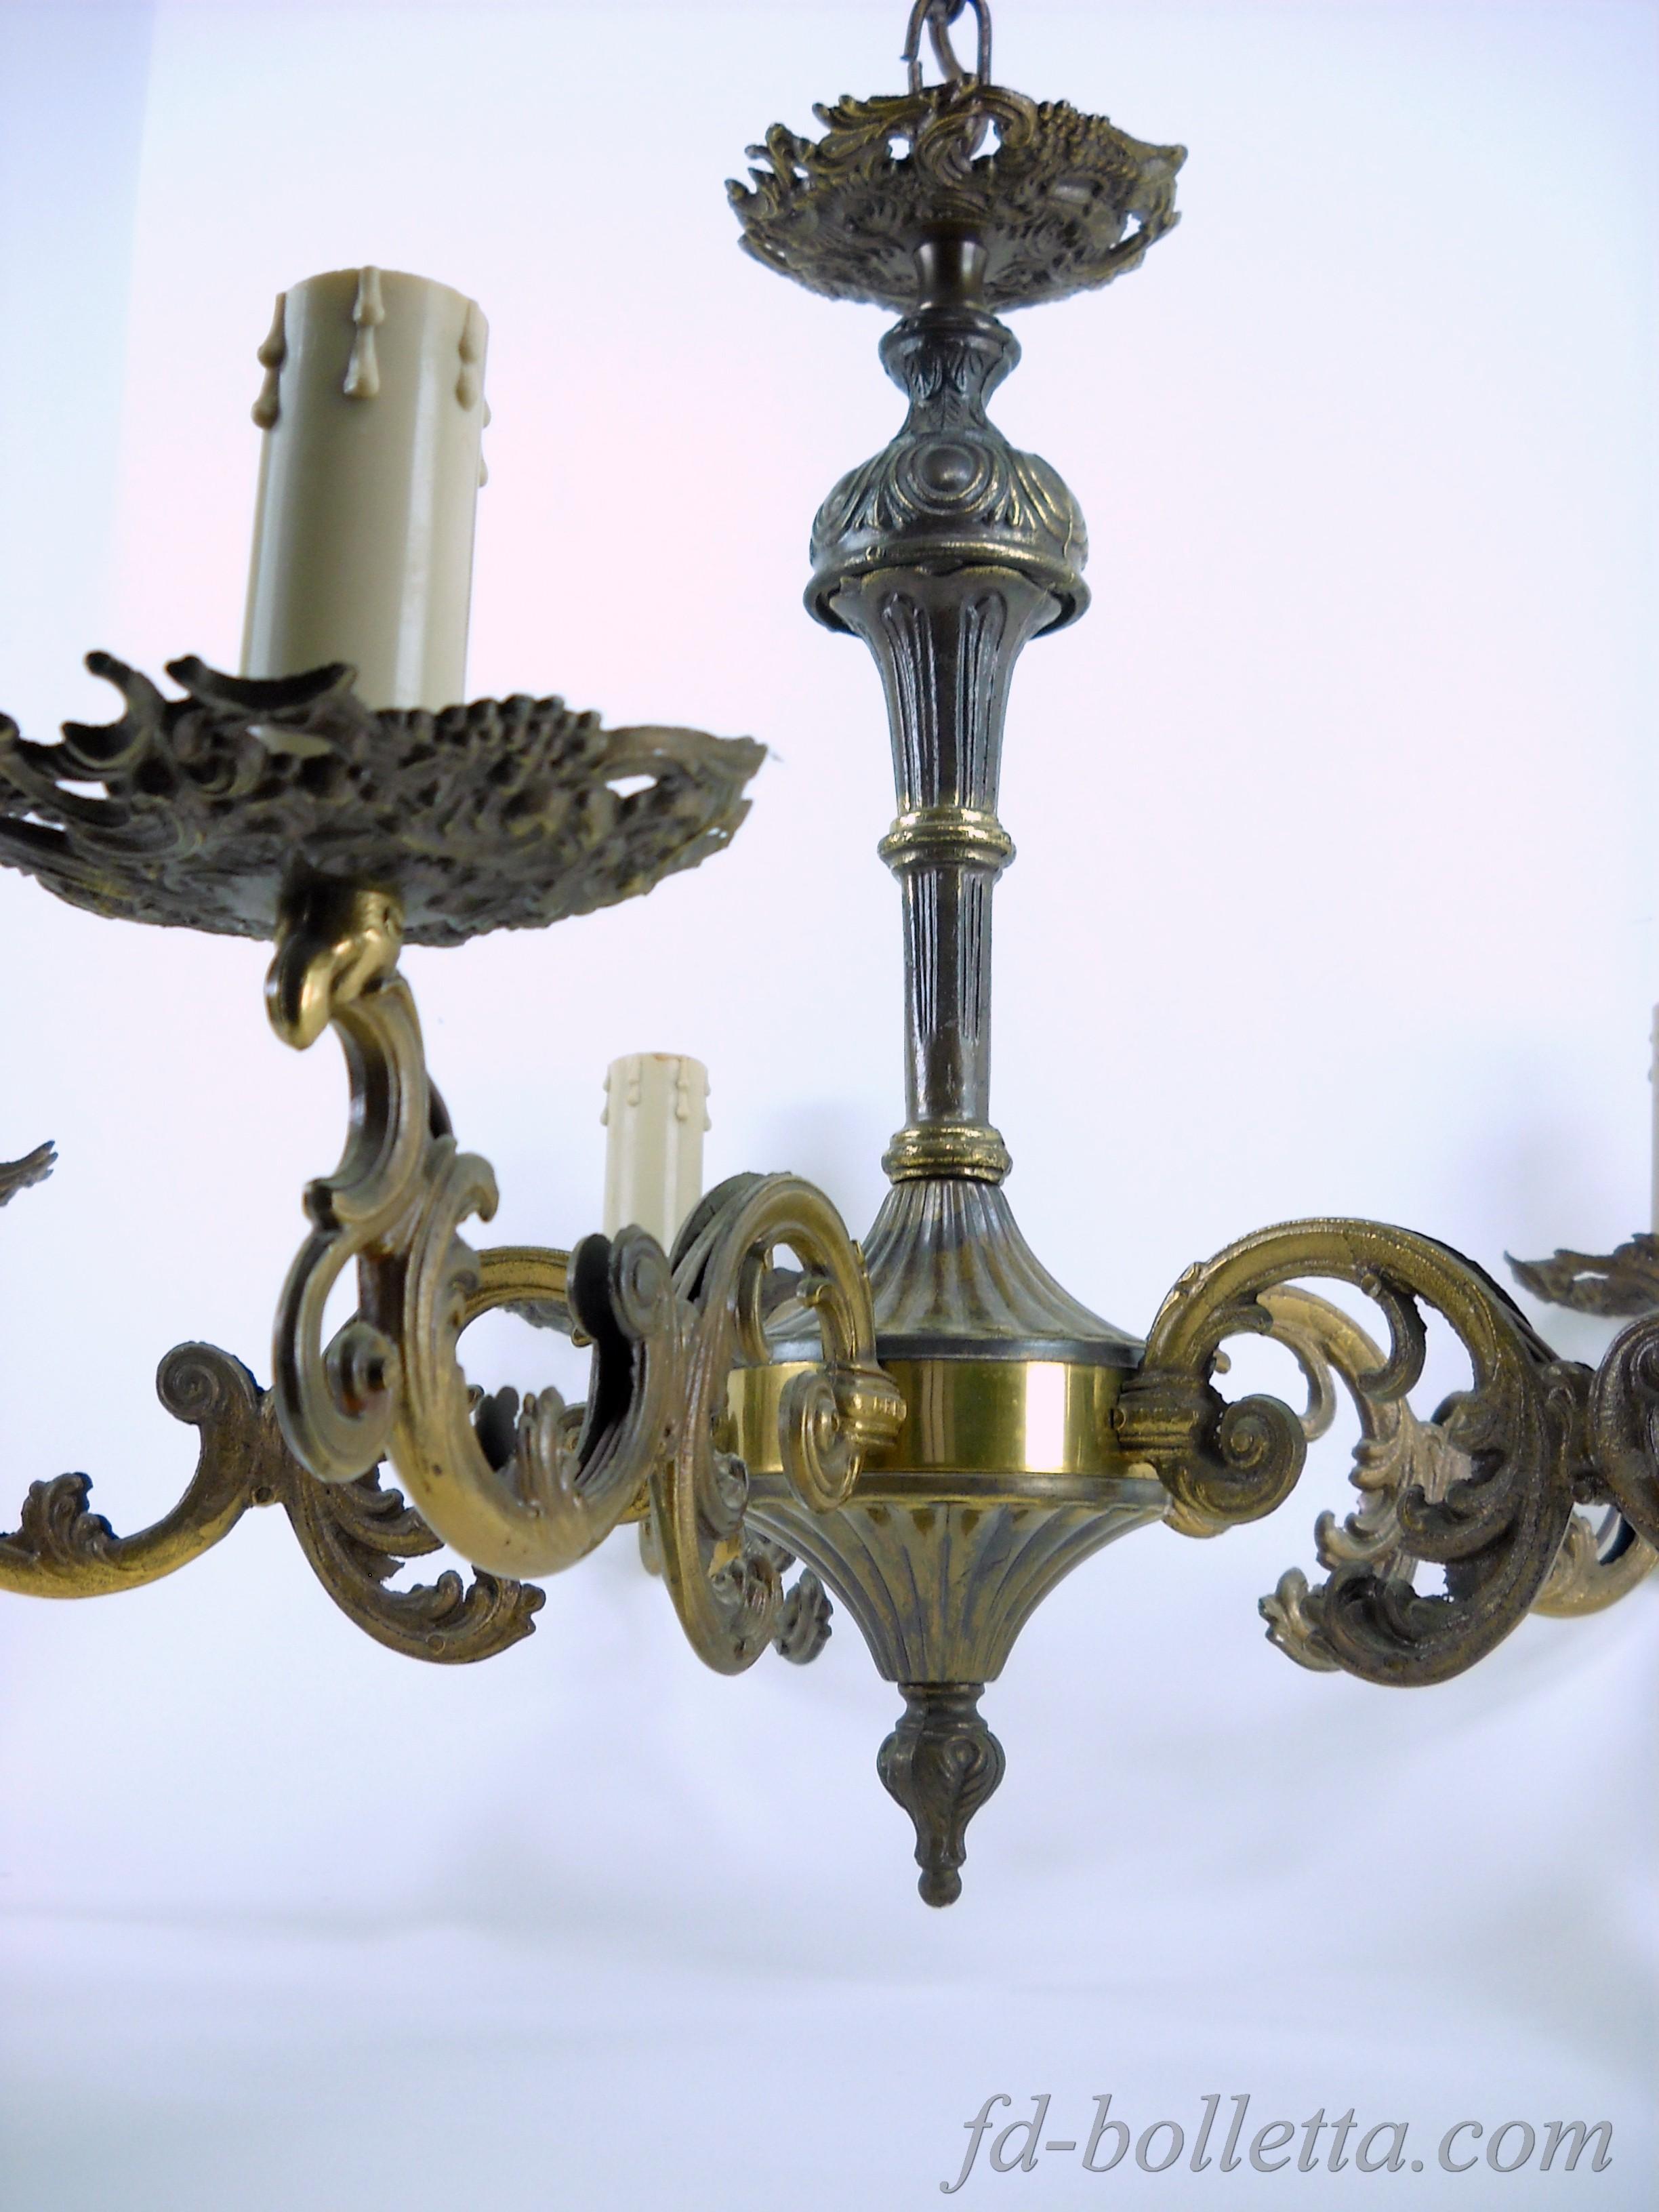 ebay lampadari antichi : ... in ottone,lampadario vintage a 5 luci,vecchi lampadari a305 eBay